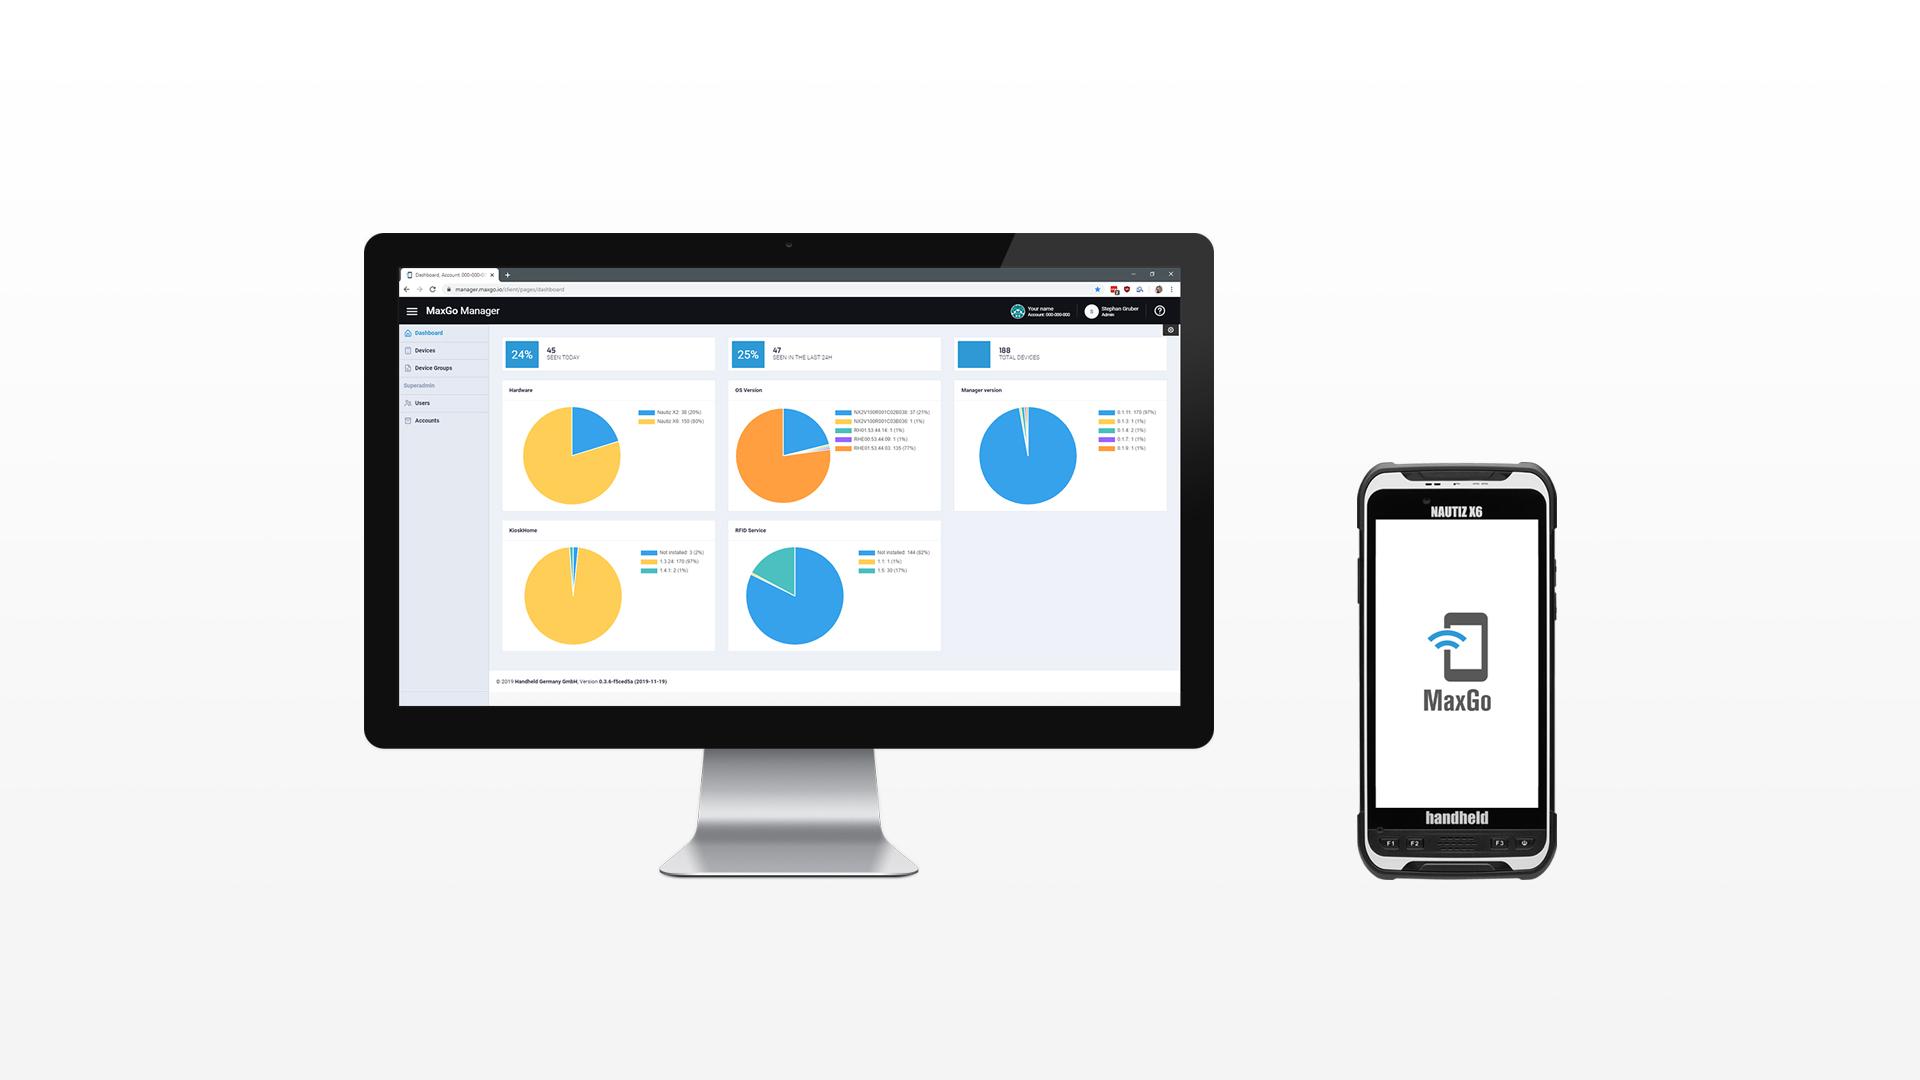 Handheld MaxGo Manager MDM solution